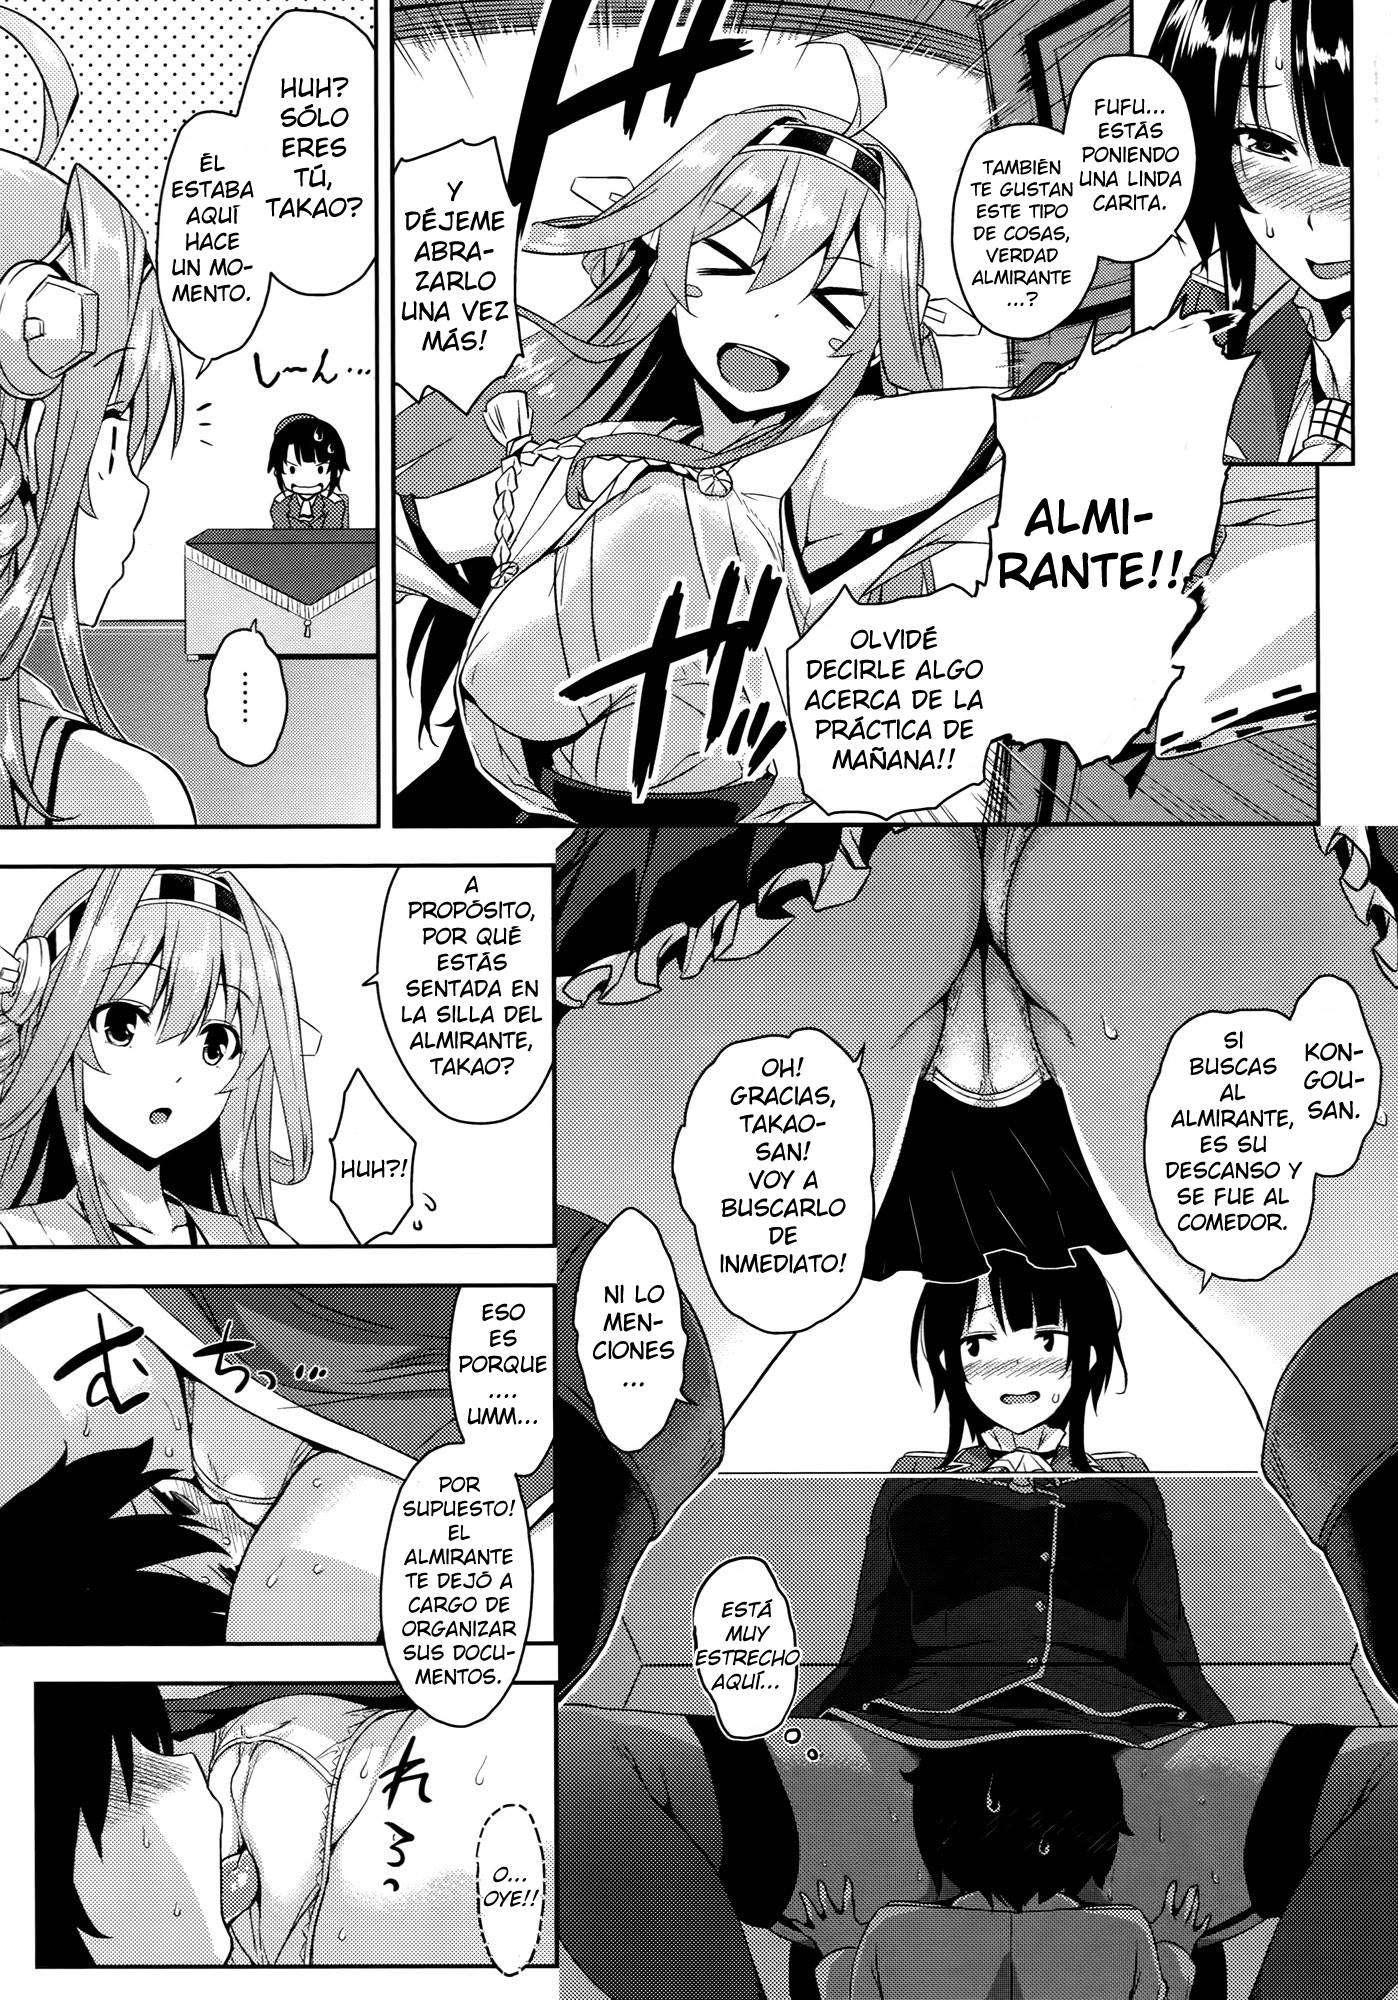 Takao Onee-san to Nyuukyo! Kai Ni Chapter-1 - 6